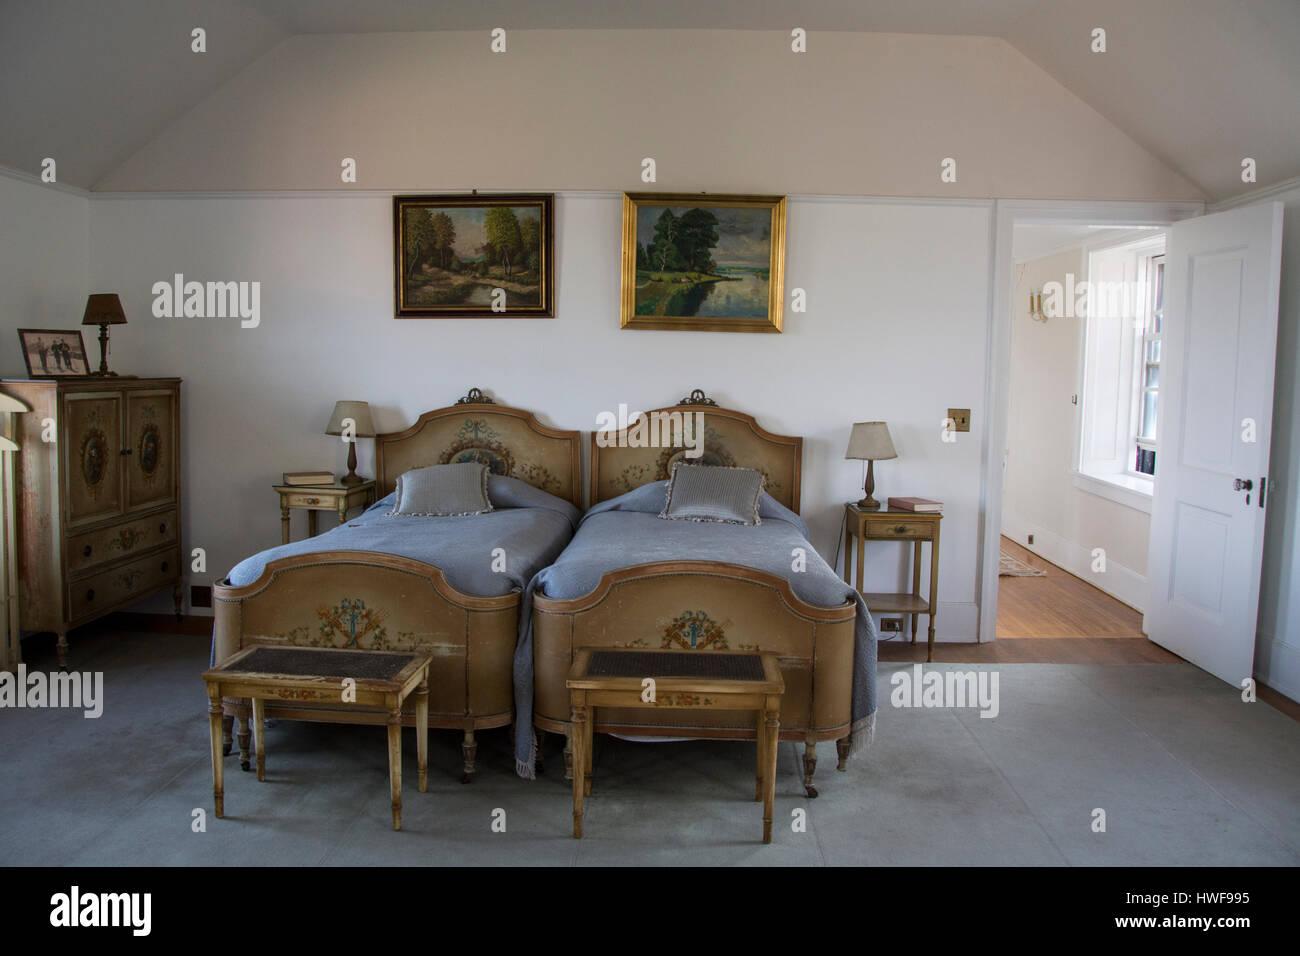 New York, Chippewa Bay, Hammond, Dark Island. Singer Castle, bedroom with antique  furniture. Property Released. - New York, Chippewa Bay, Hammond, Dark Island. Singer Castle, Bedroom